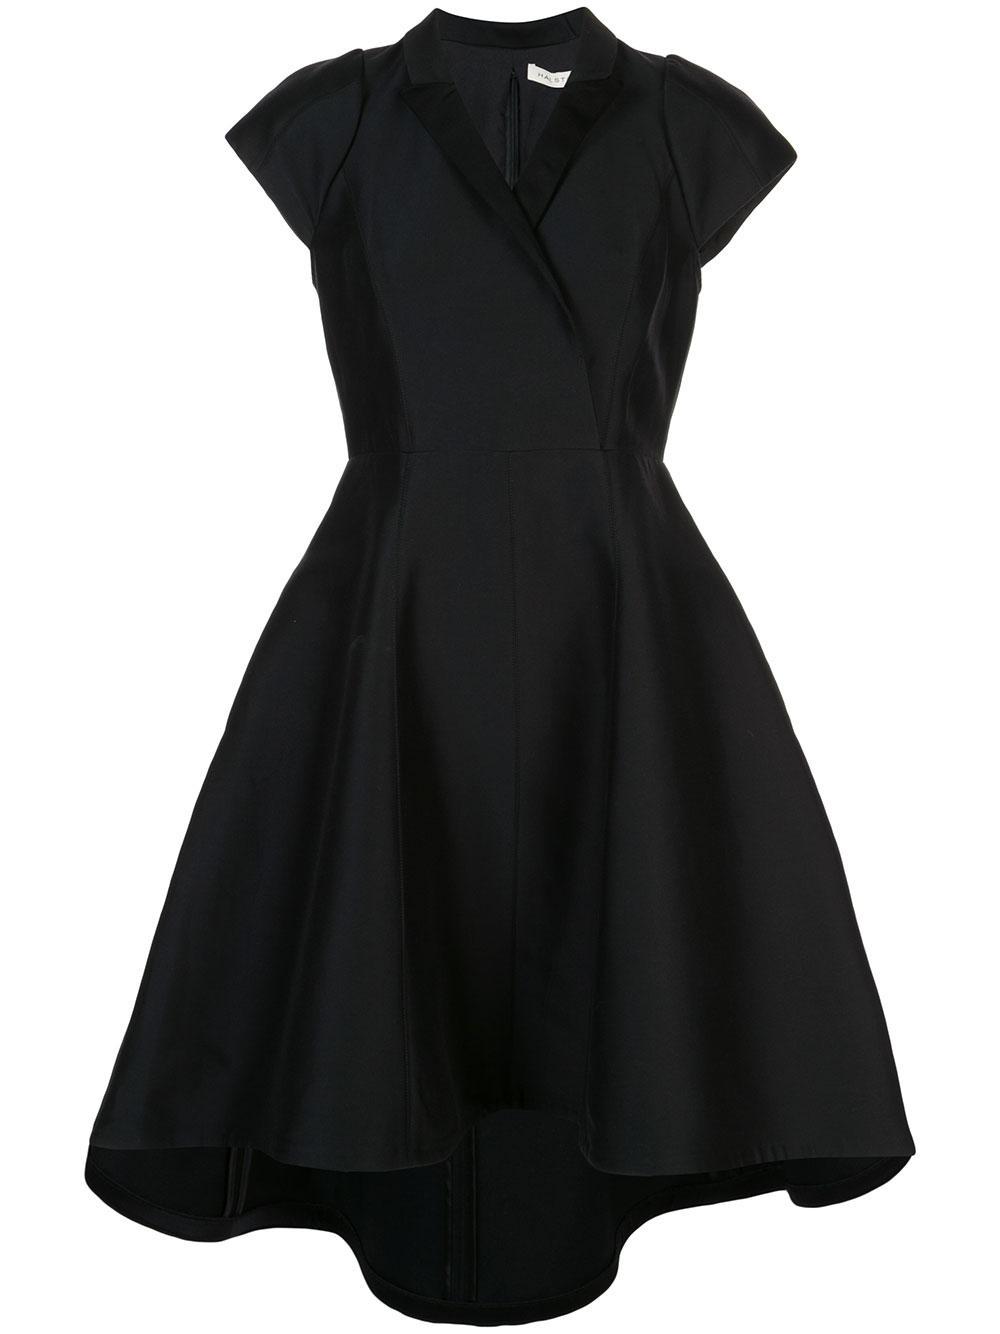 Tuxedo Silk Faille Dress Item # SFT153028C